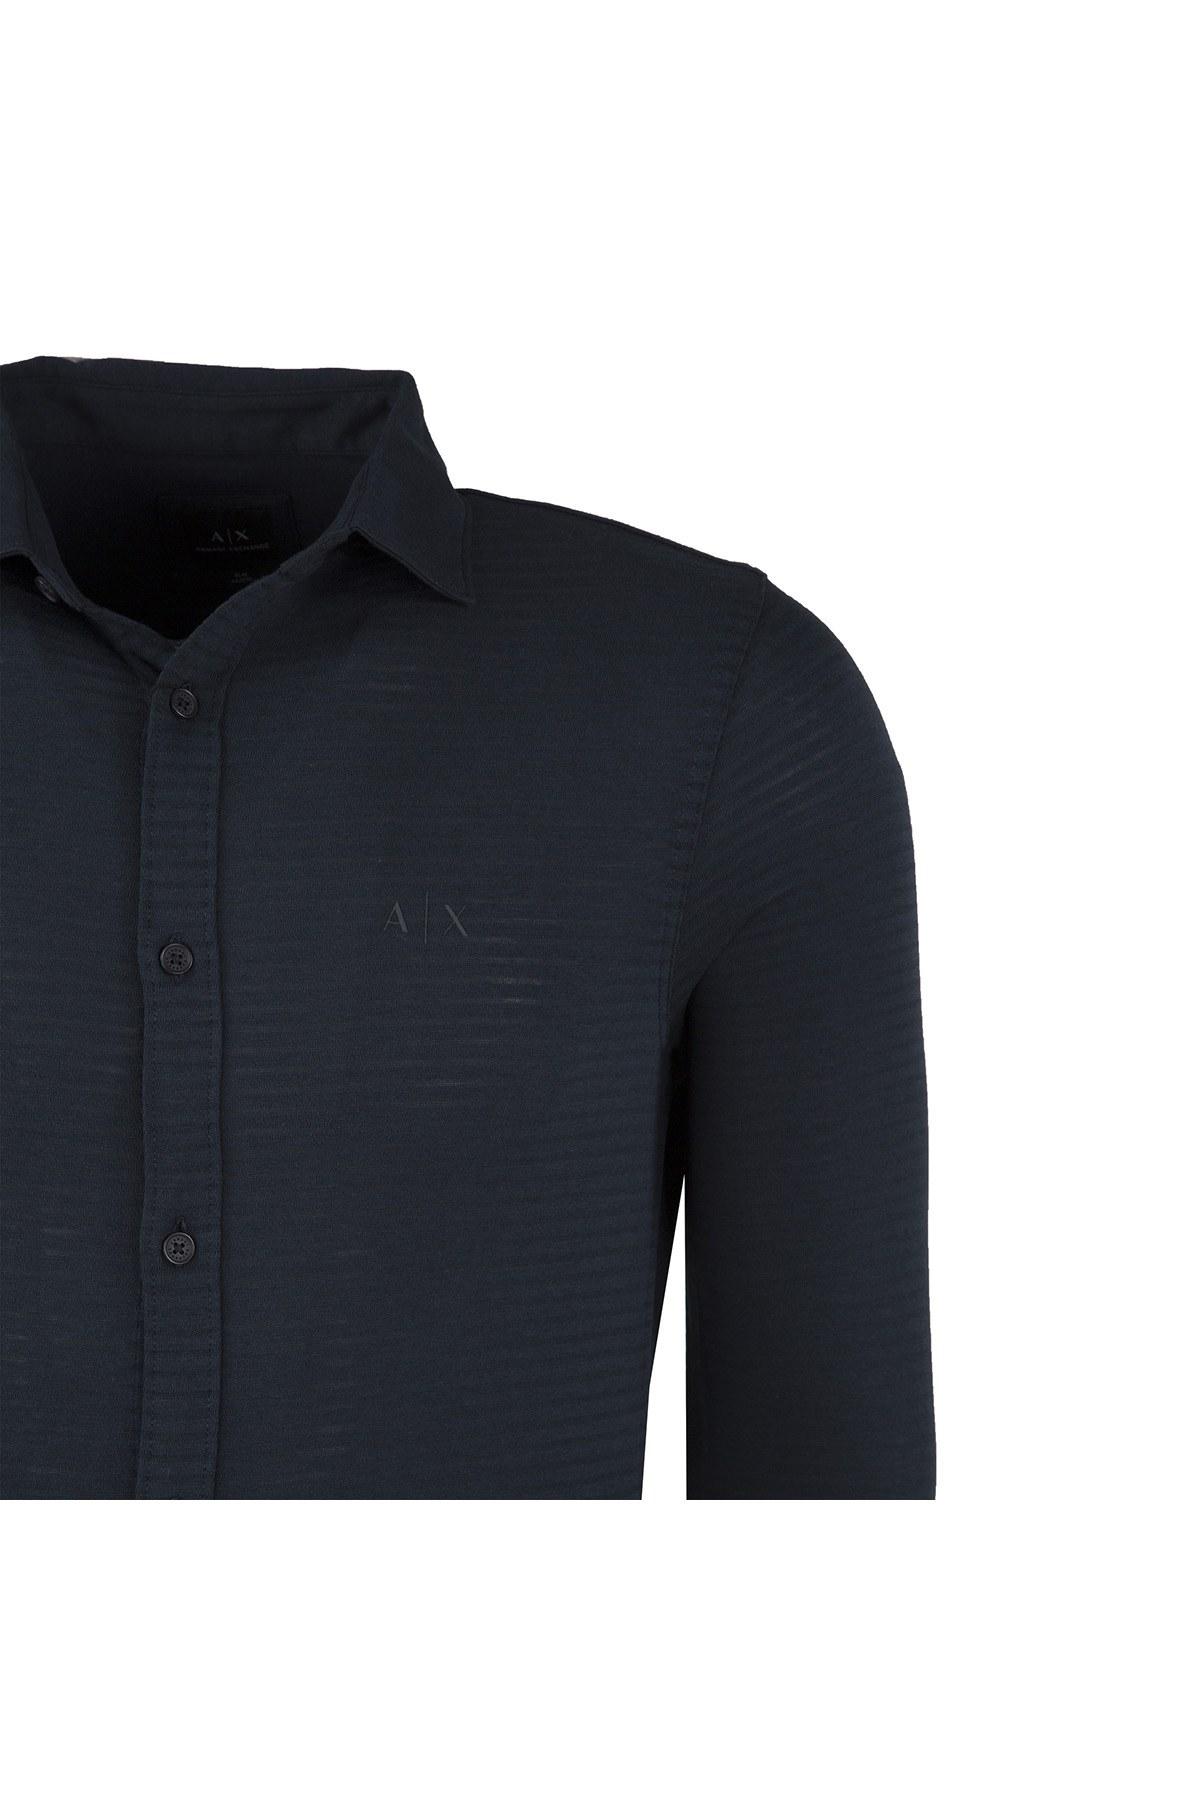 ARMANI EXCHANGE Erkek Gömlek 6ZZC71 ZJBDZ 1510 LACİVERT